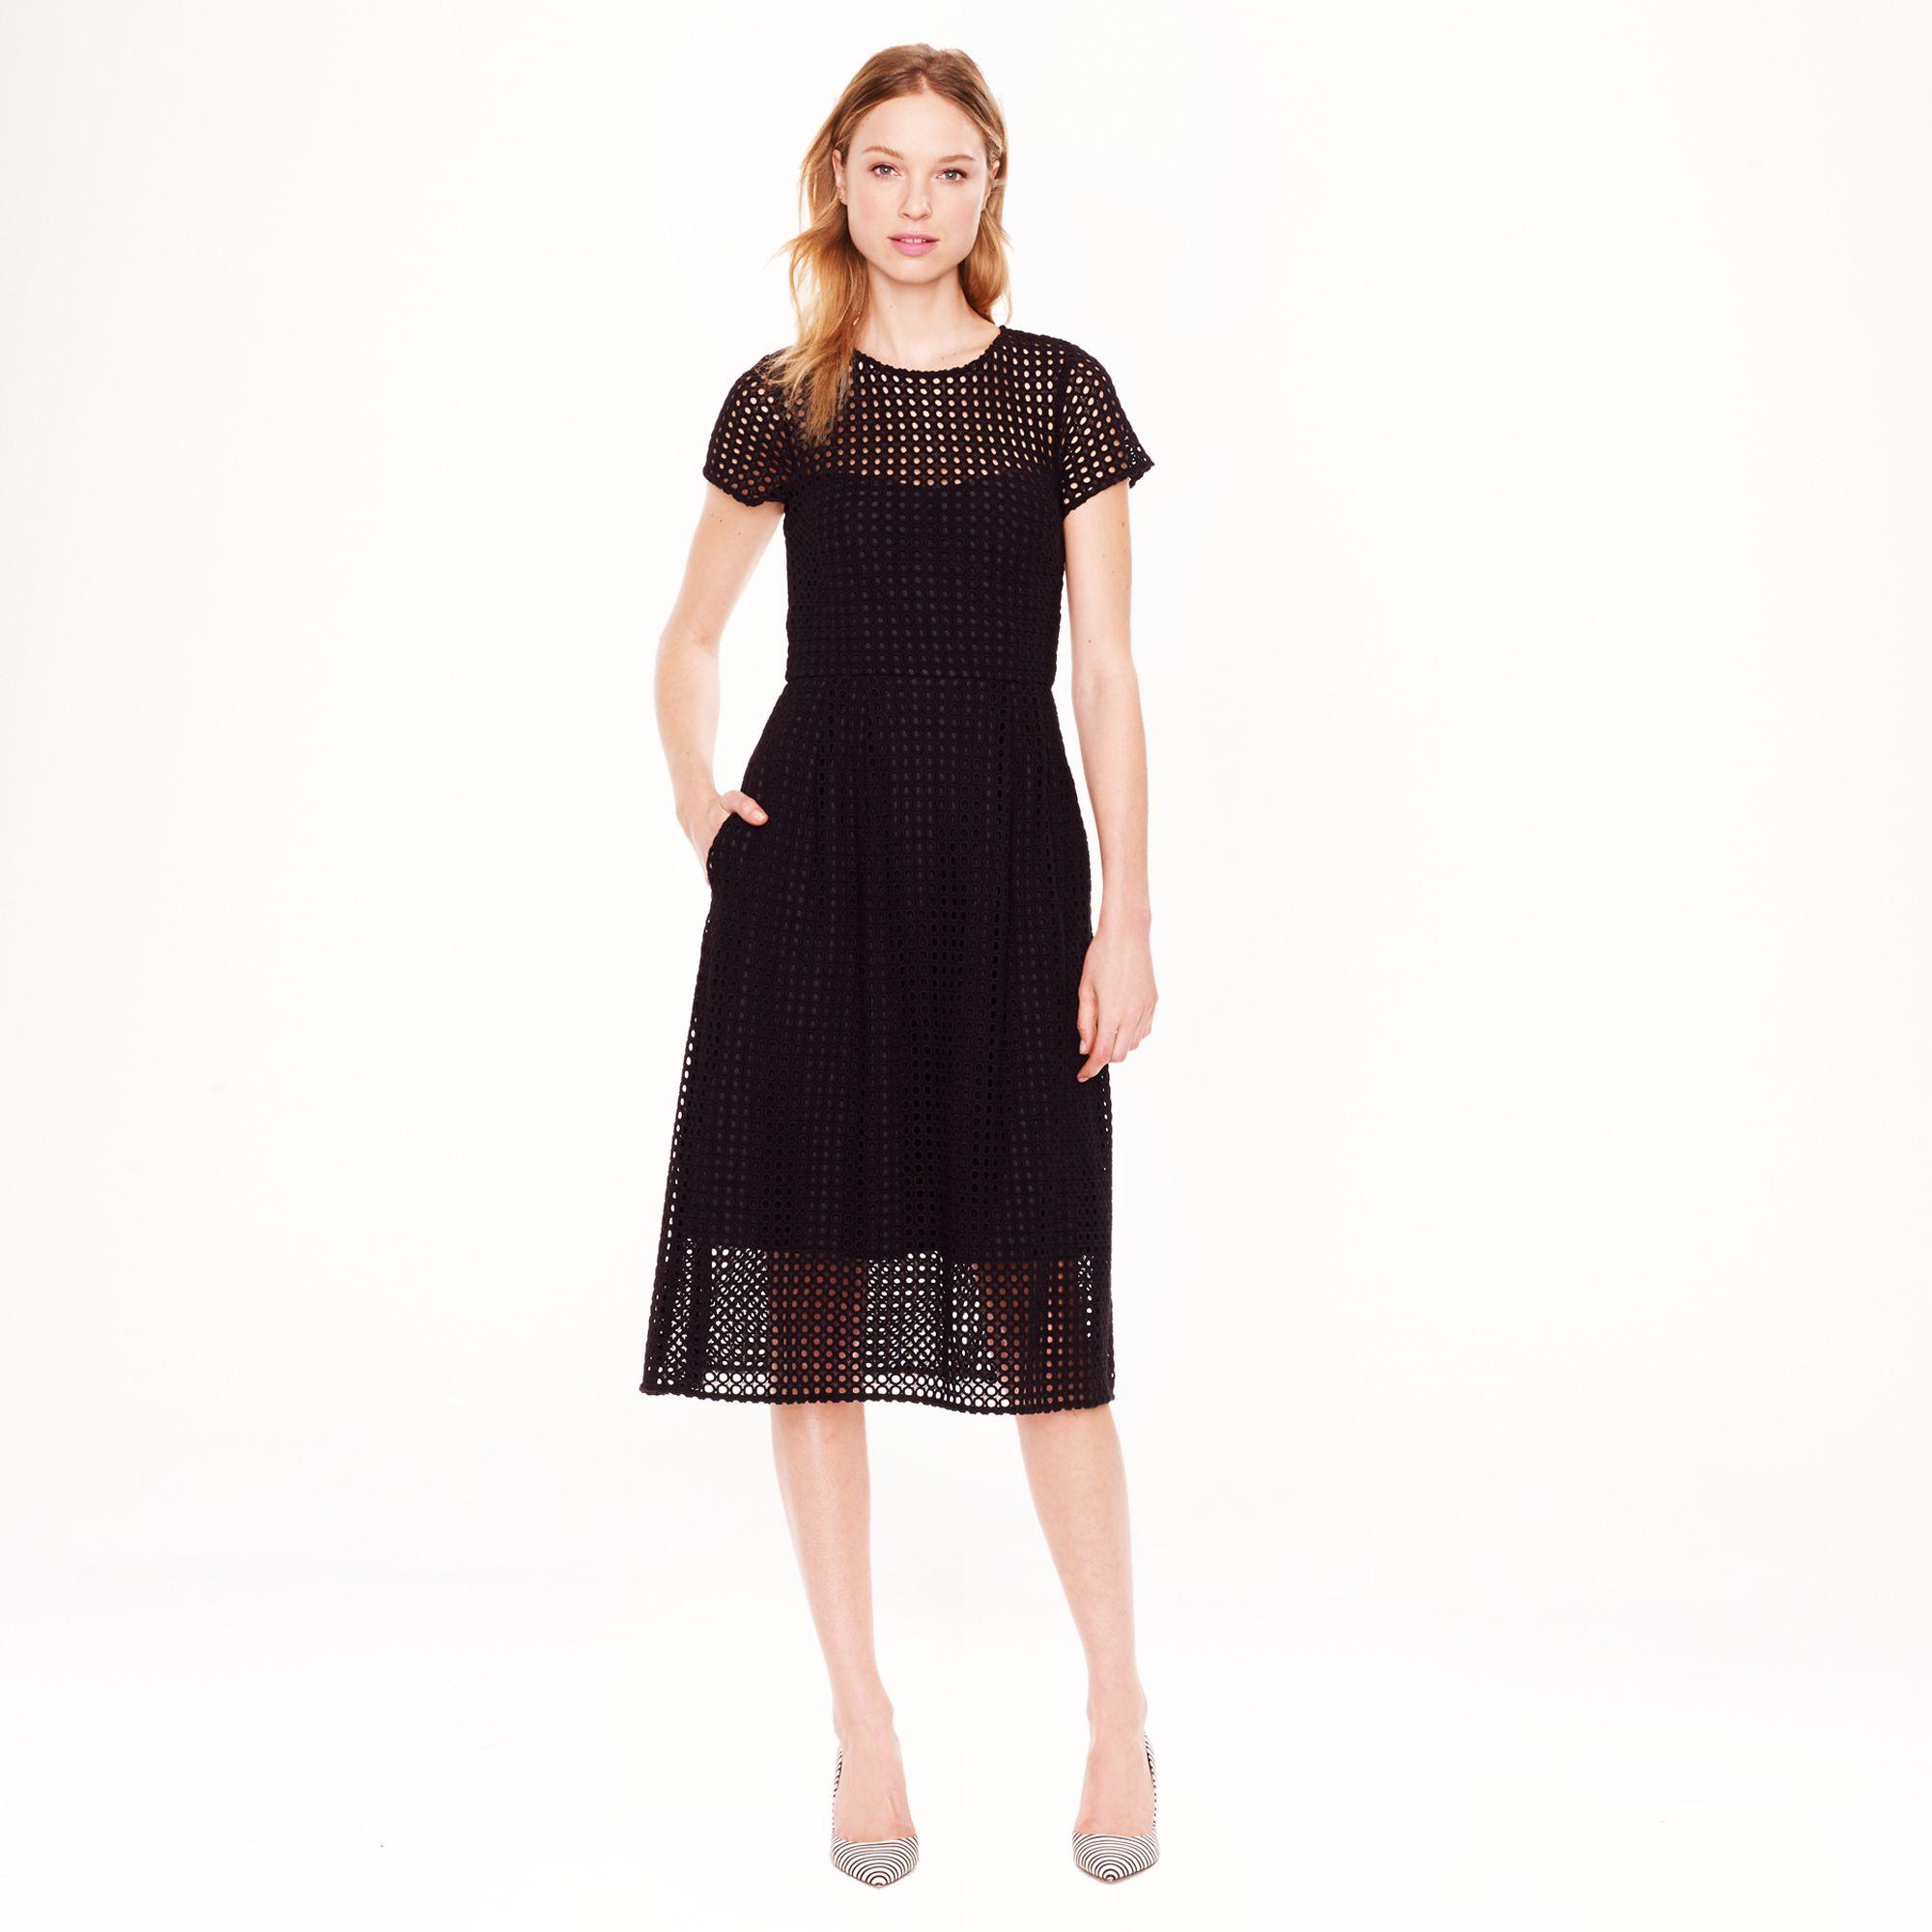 Black dress j crew - Gallery